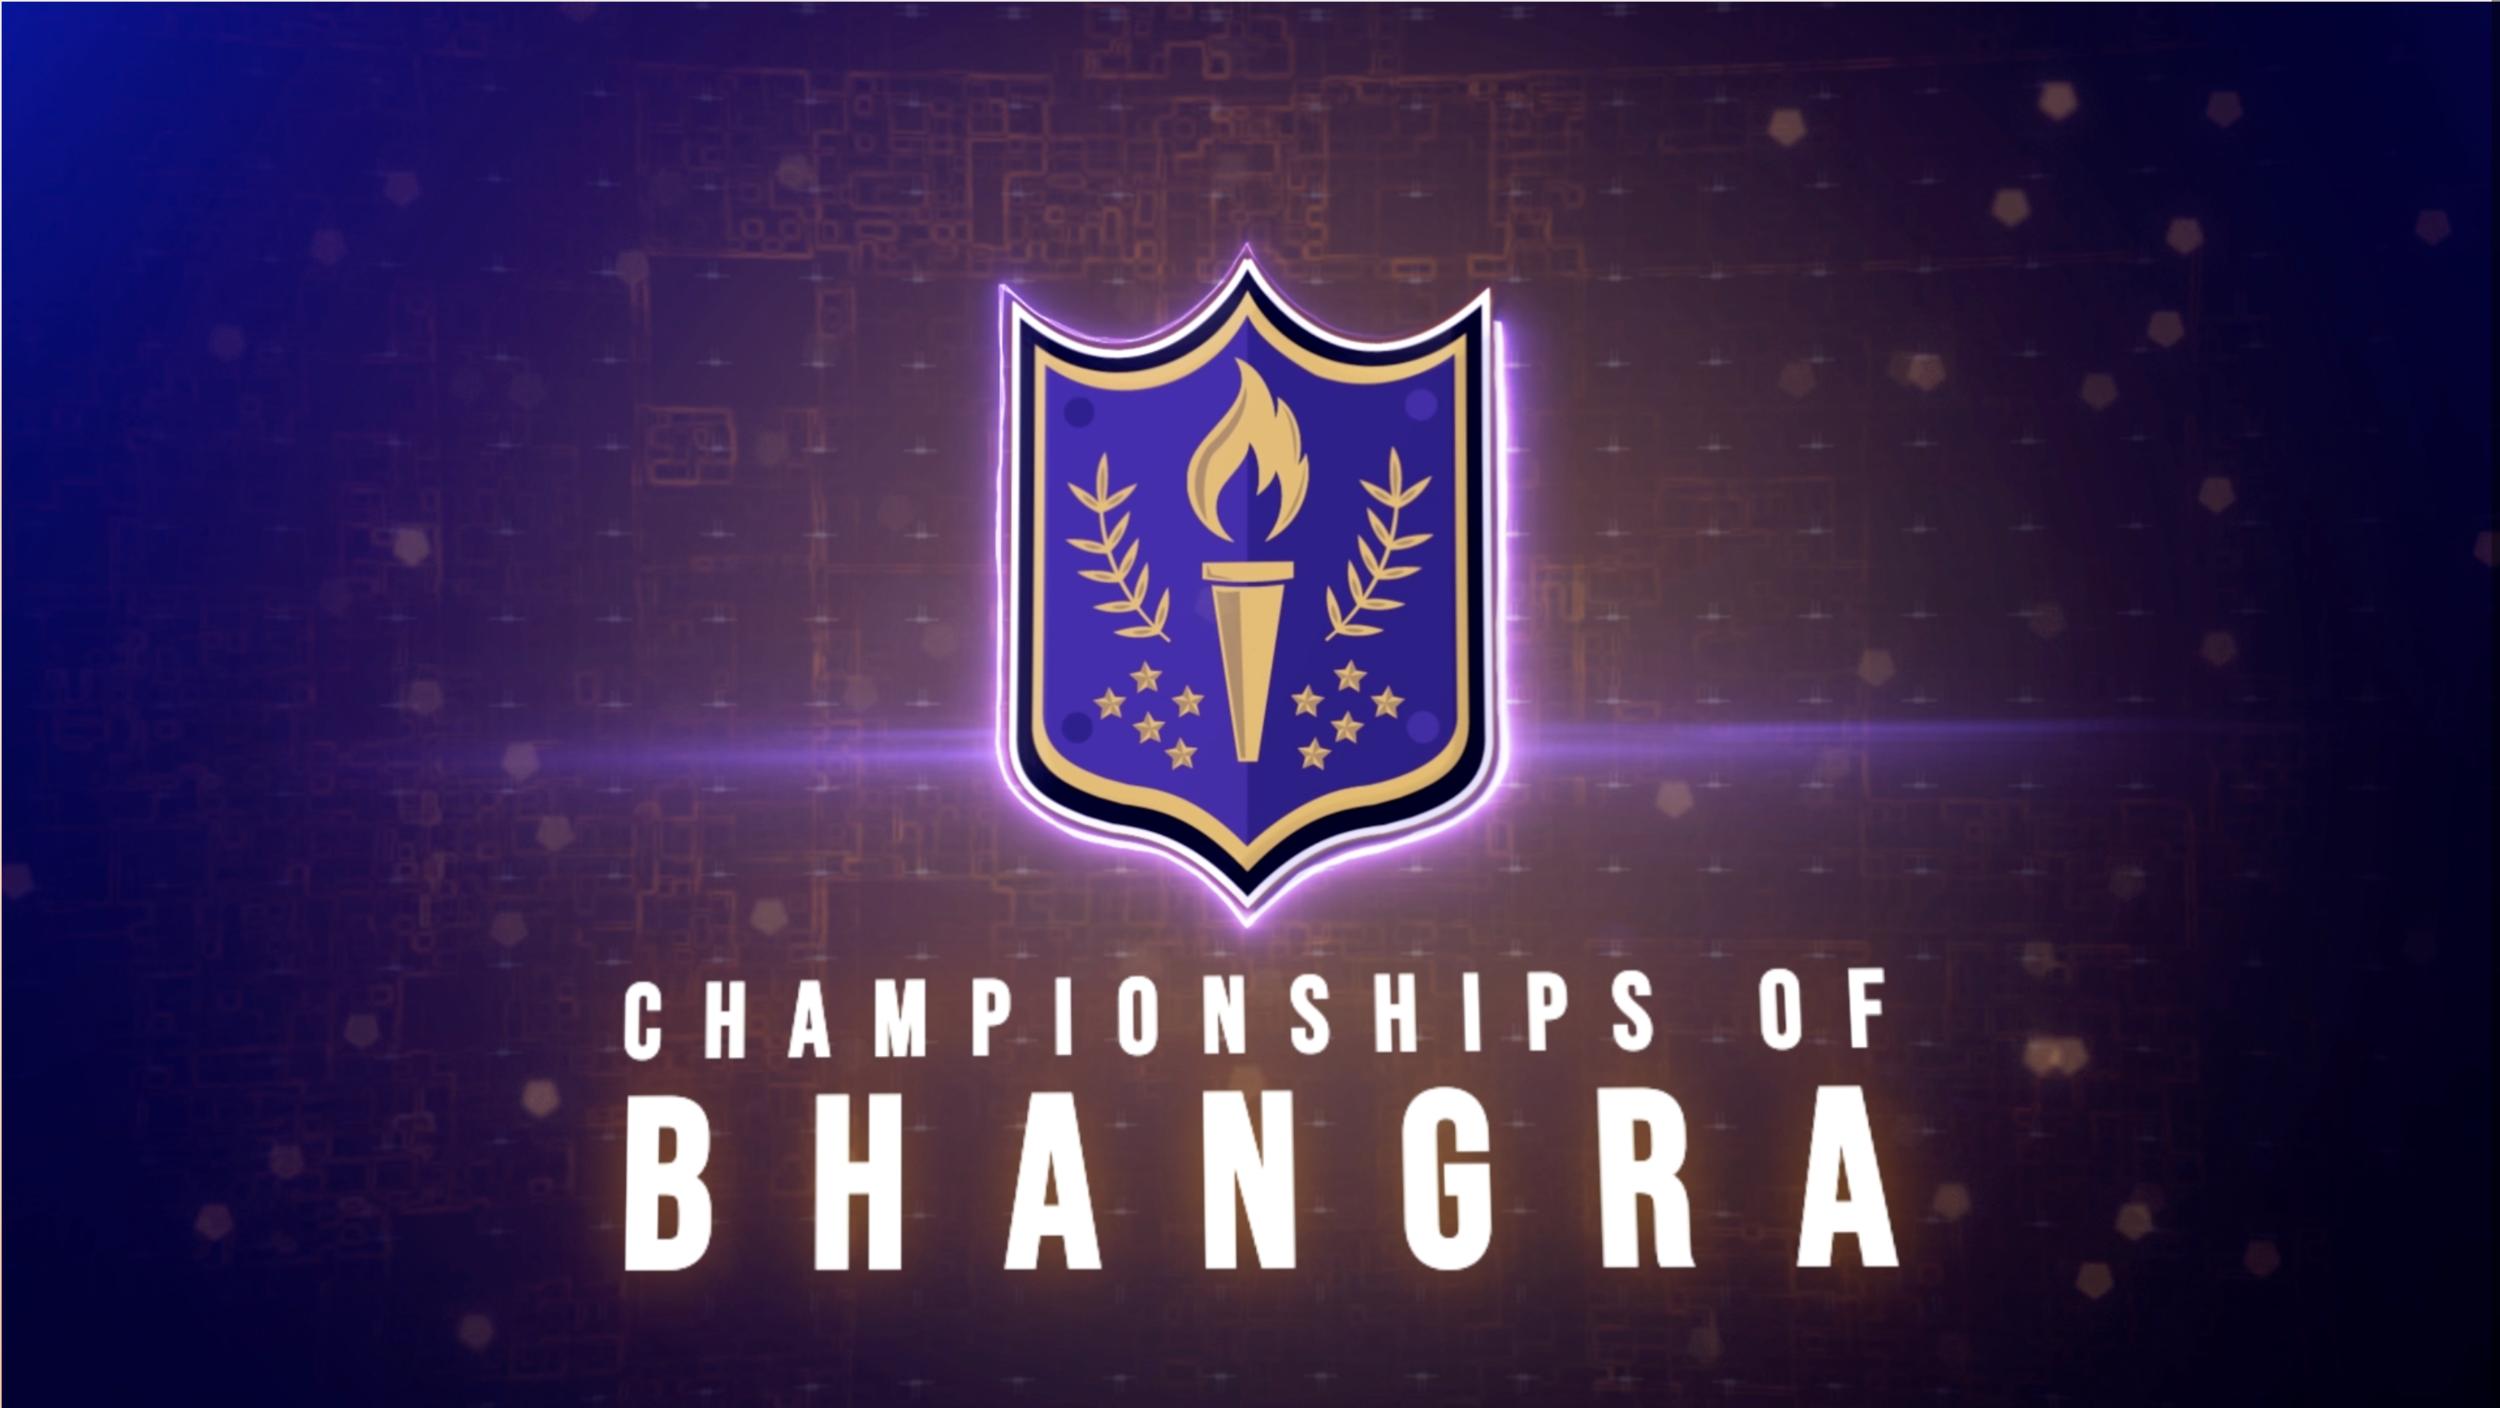 Championships of Bhangra 2019